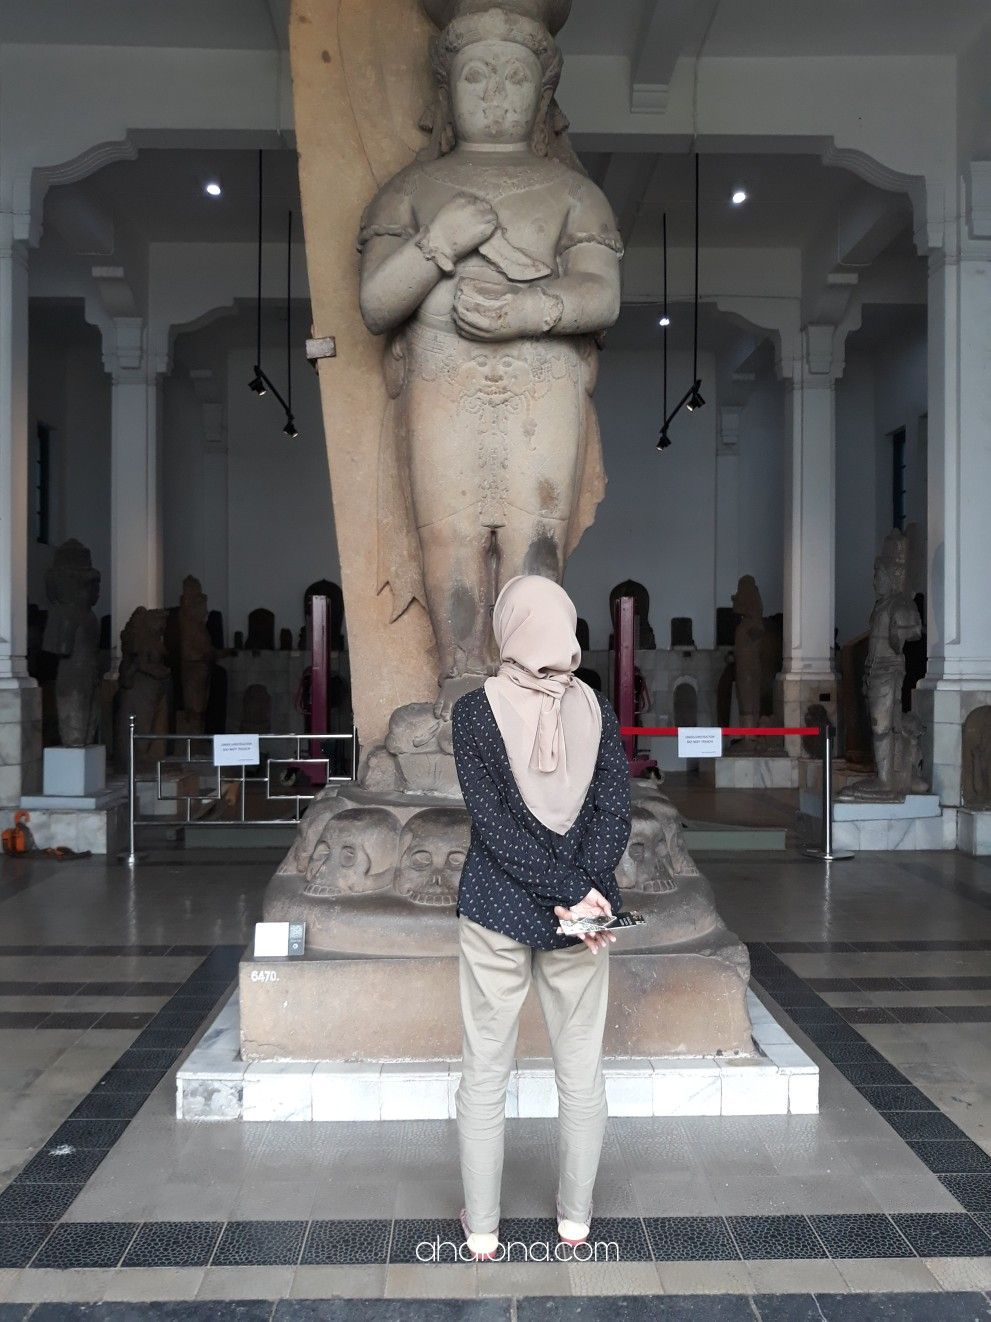 Patung Bhairawa di Museum nasinal. Patung tertinggi.